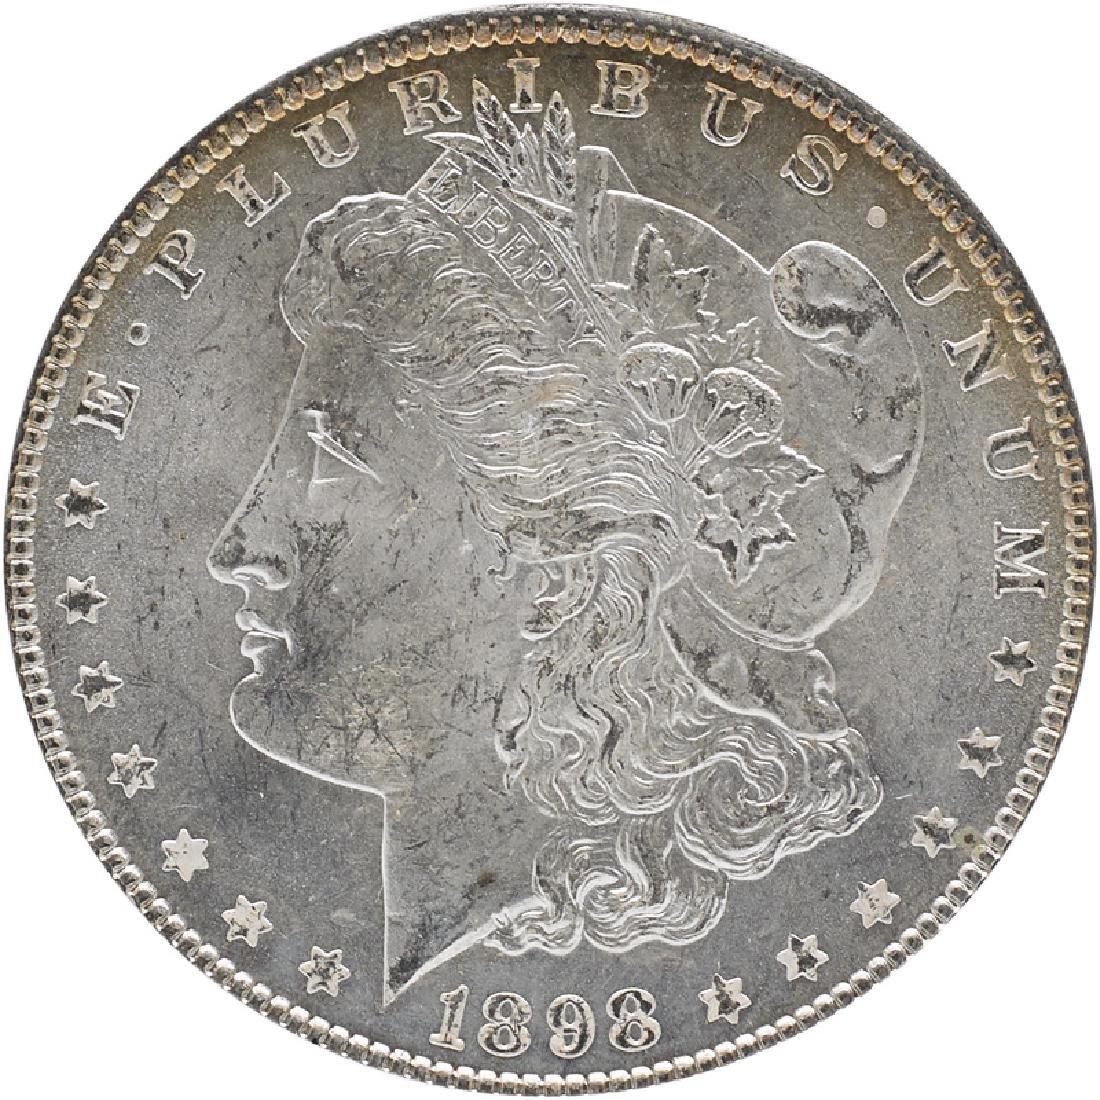 U.S. 1898 MORGAN $1 COIN